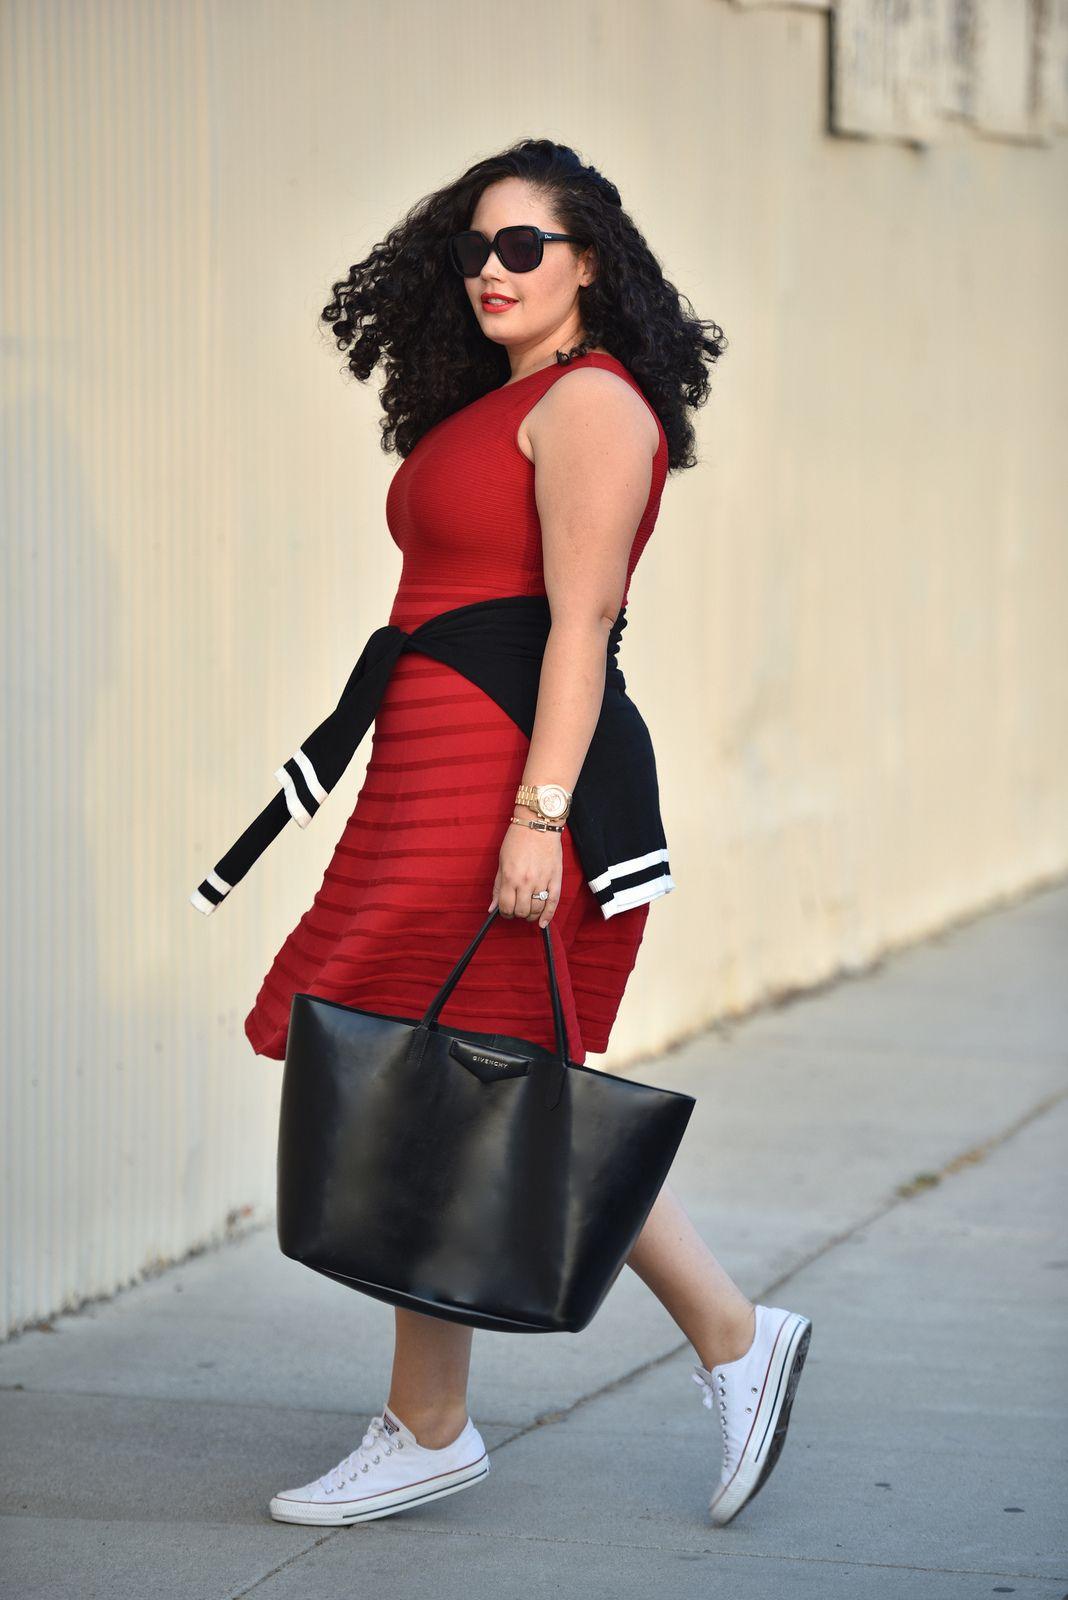 108e9e9392ee5 Plus Size Fashion - Dress and Converse